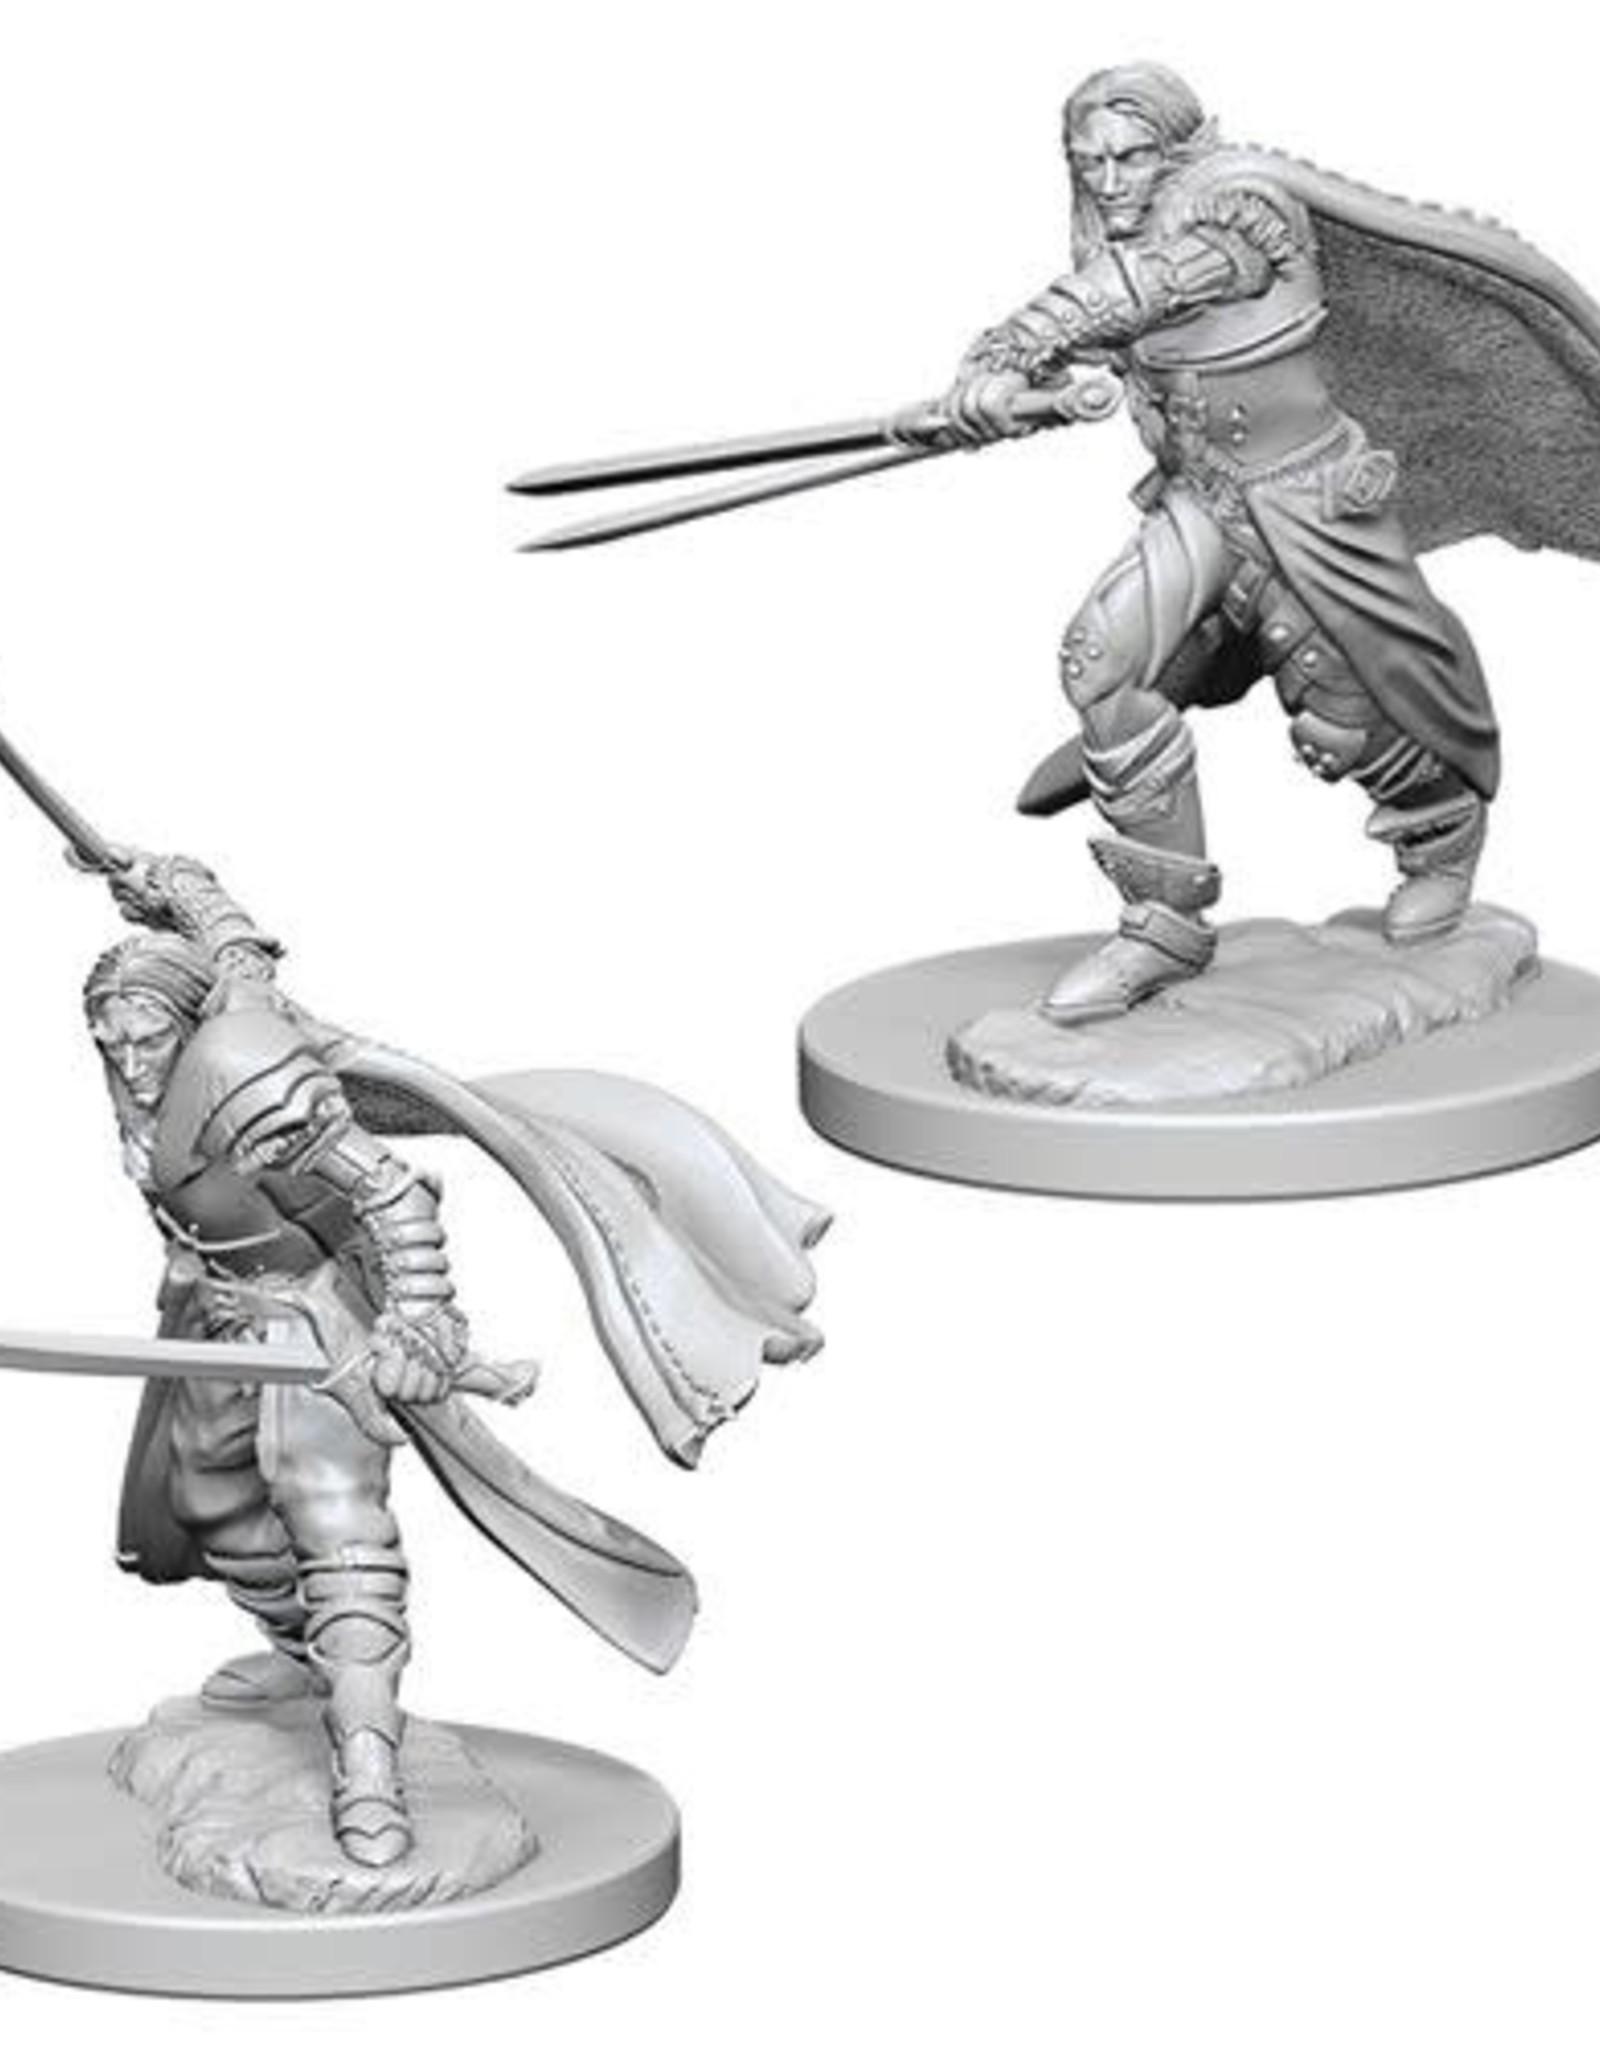 WizKids Dungeons & Dragons Nolzur's Marvelous Miniatures: Male Elf Ranger